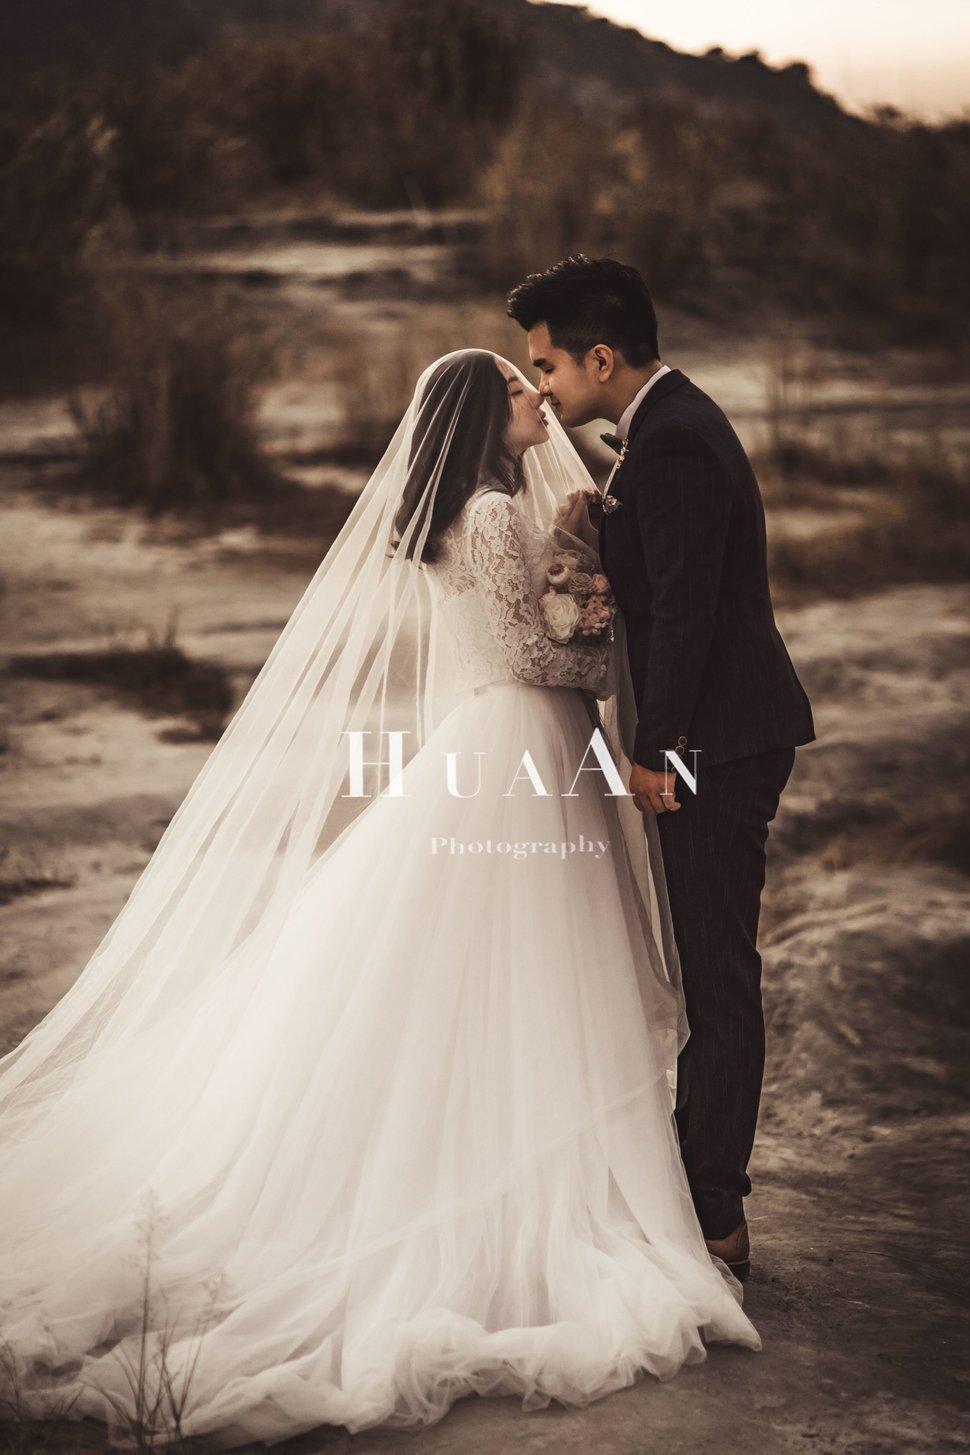 DSC05325 - Huaan Photography《結婚吧》